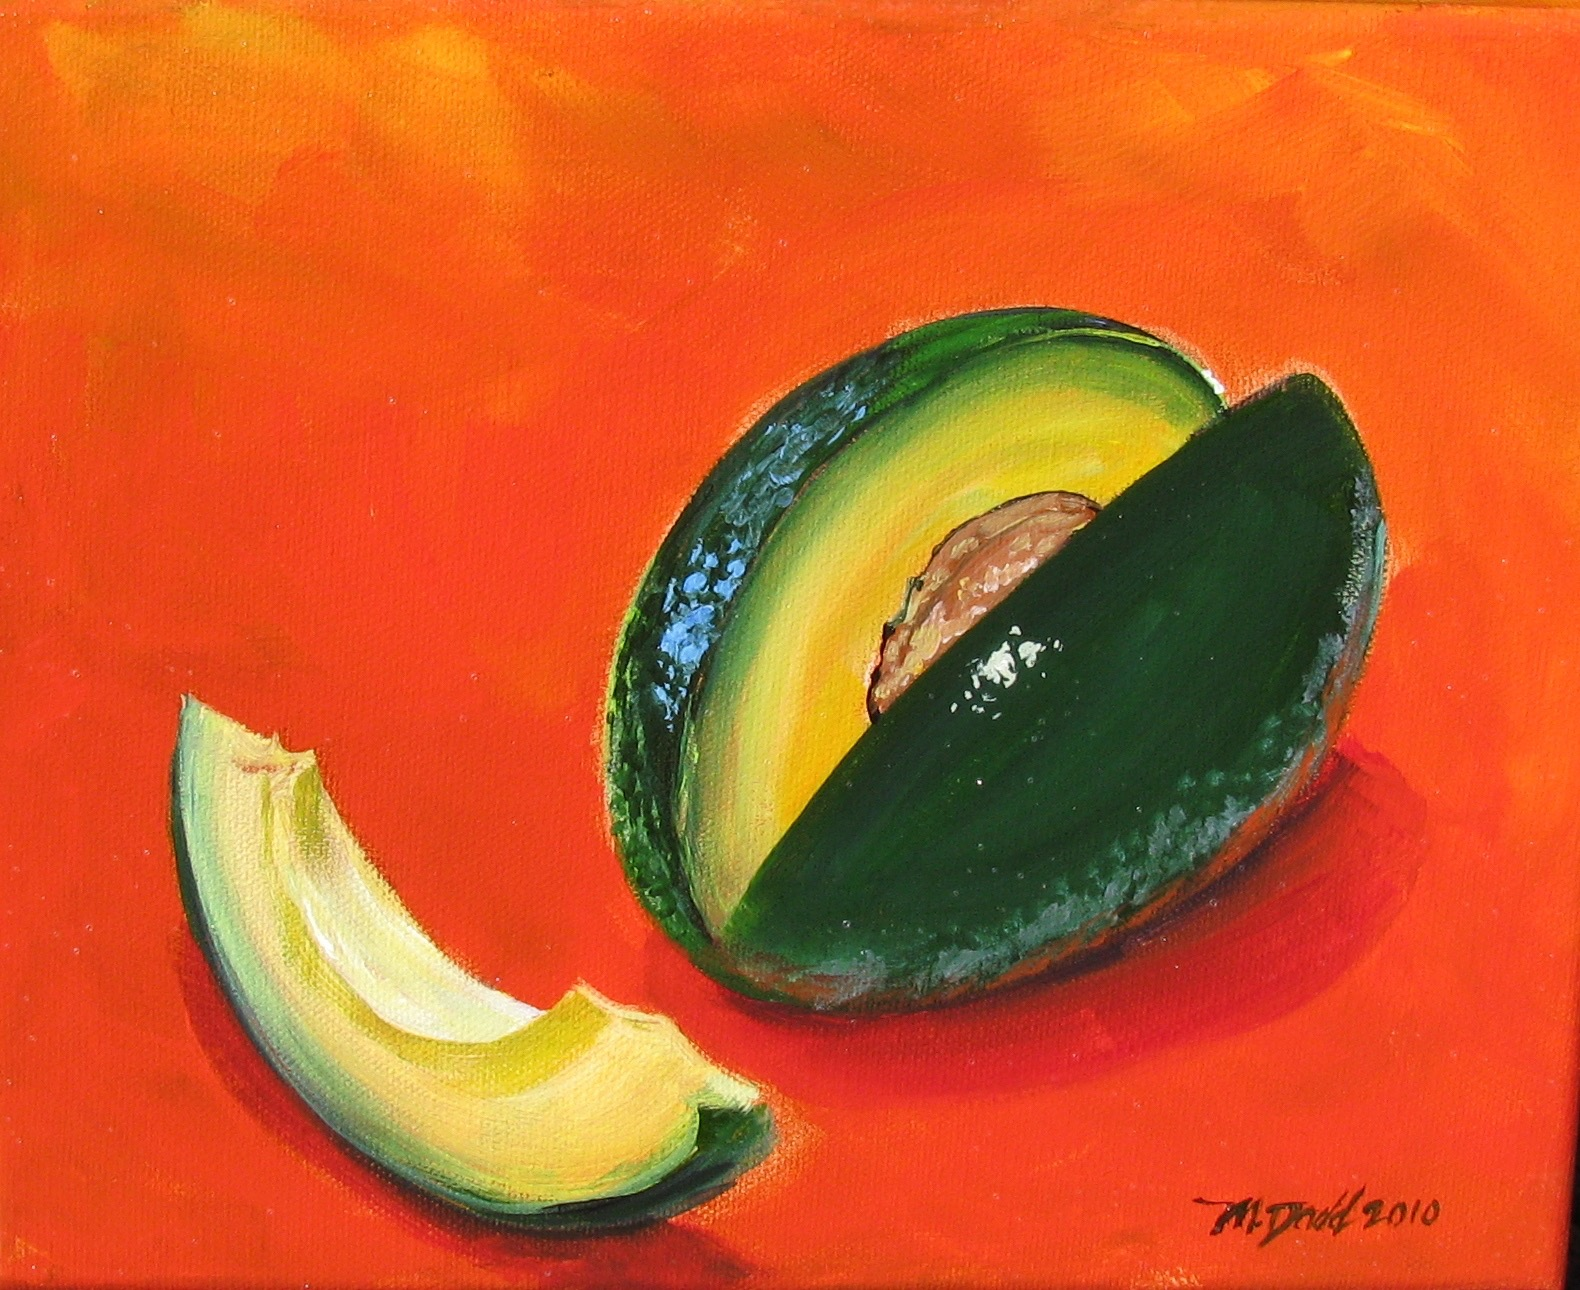 """Avocado on Cinnamon"" – Still Life Prints"